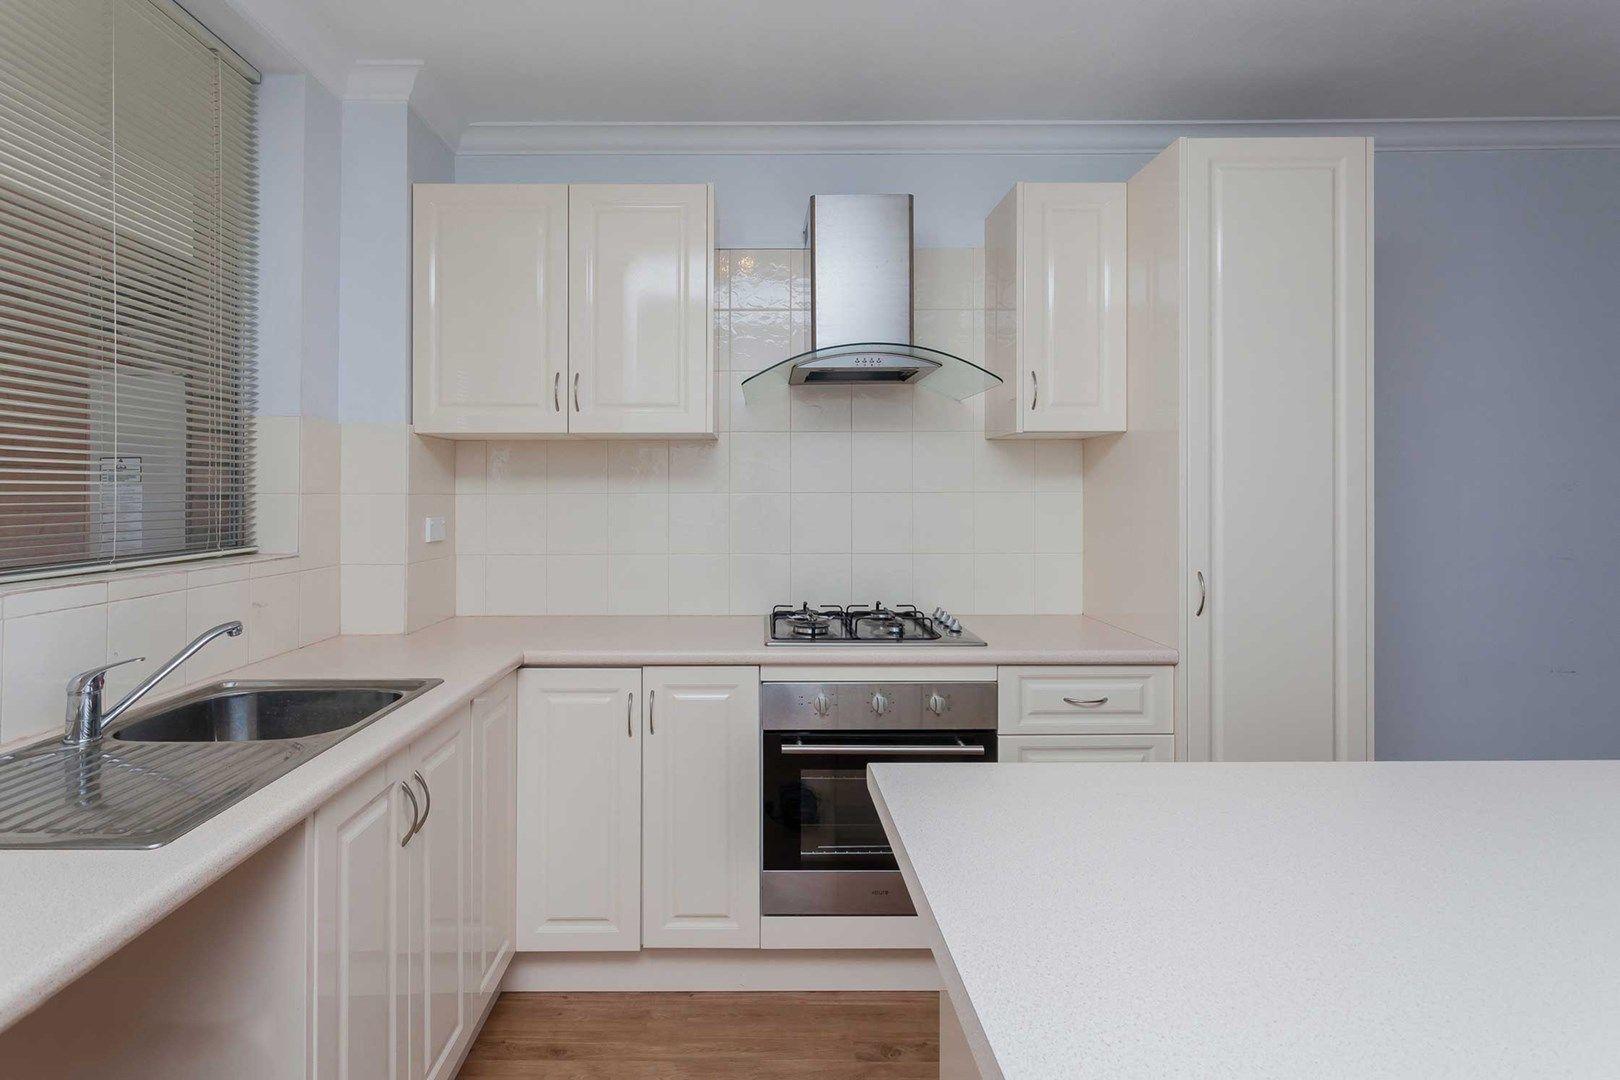 26/537 William Street, Mount Lawley WA 6050, Image 0